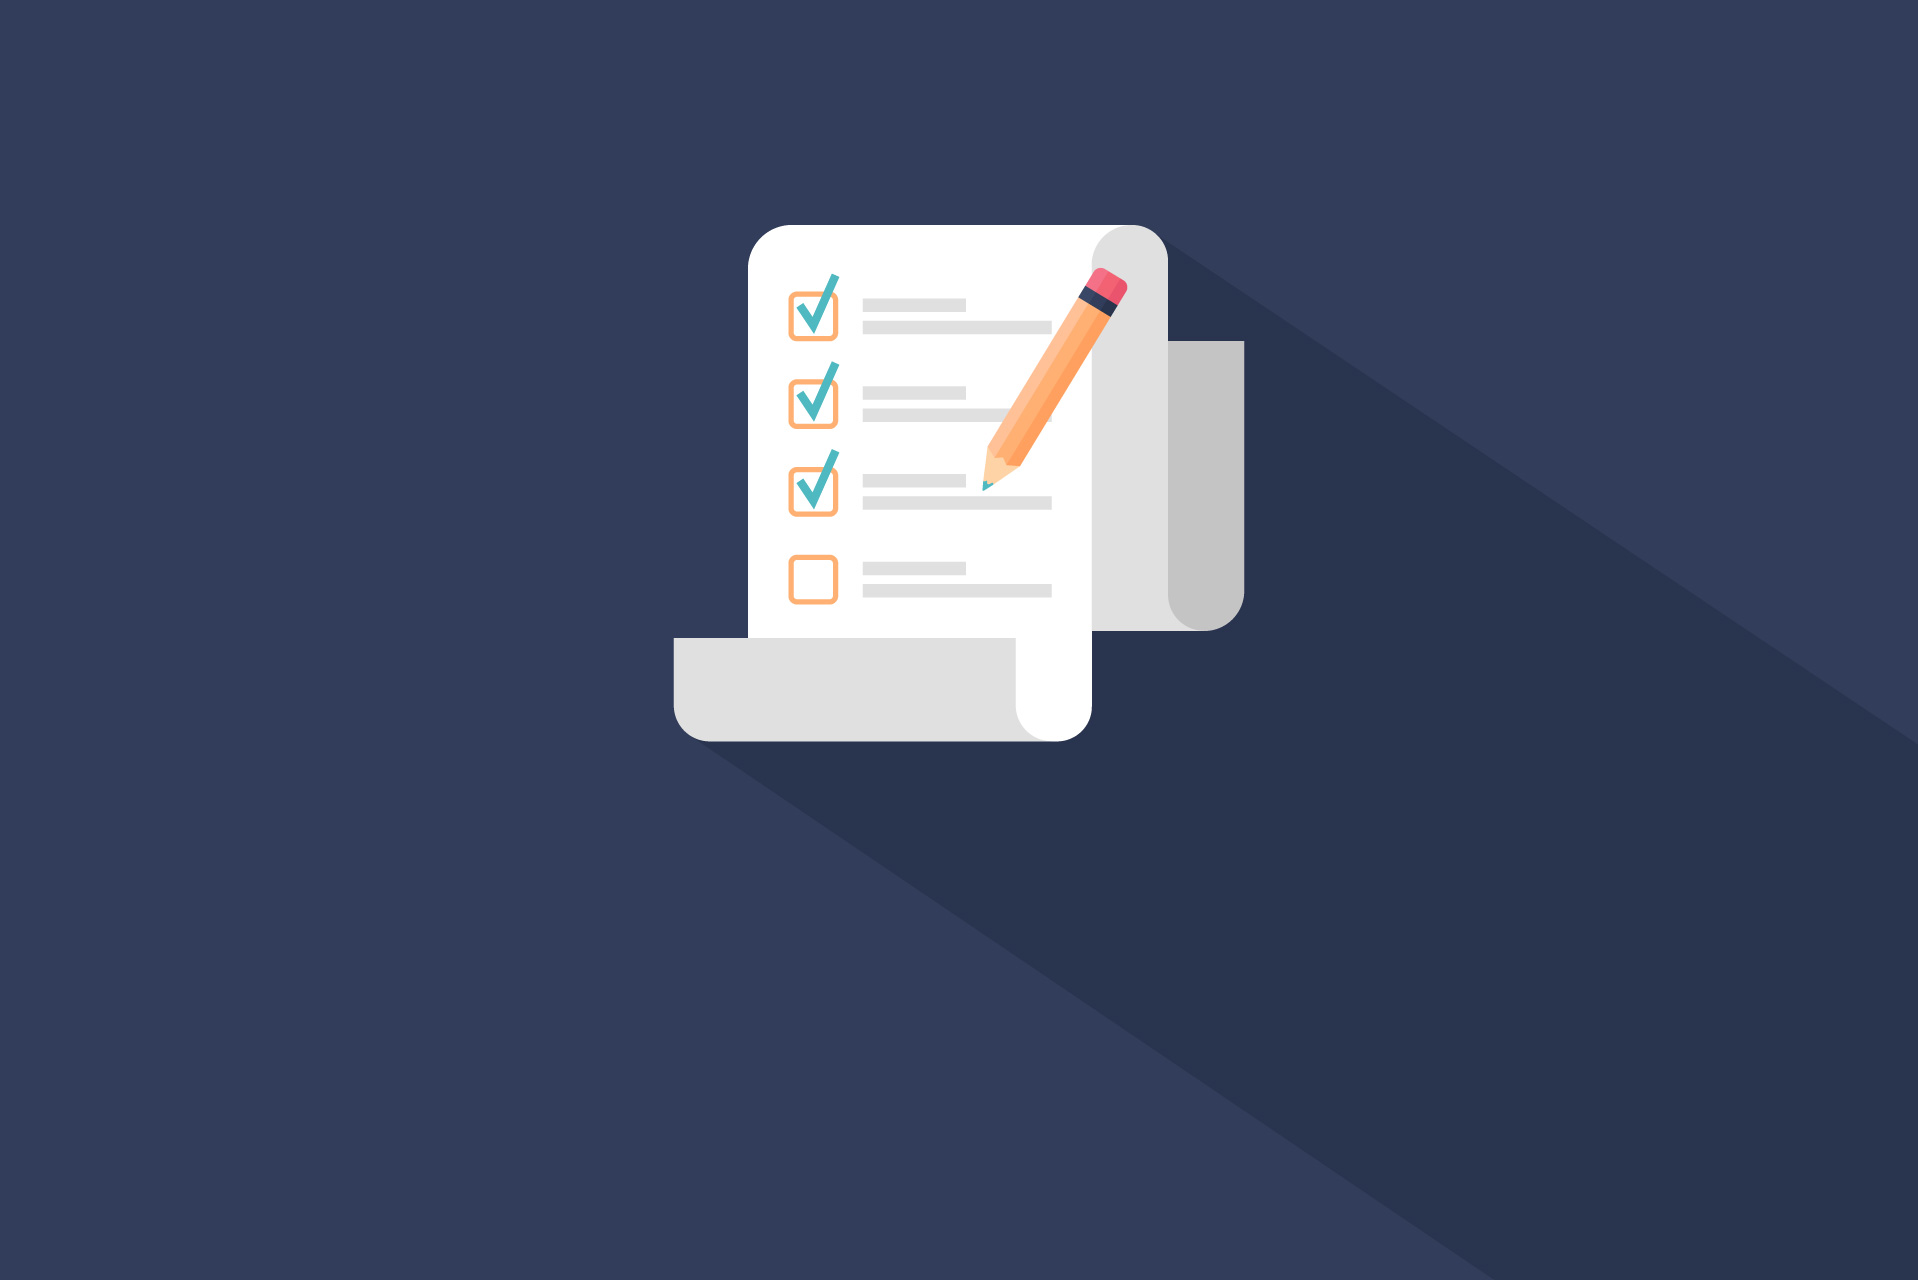 New e-commerce website checklist